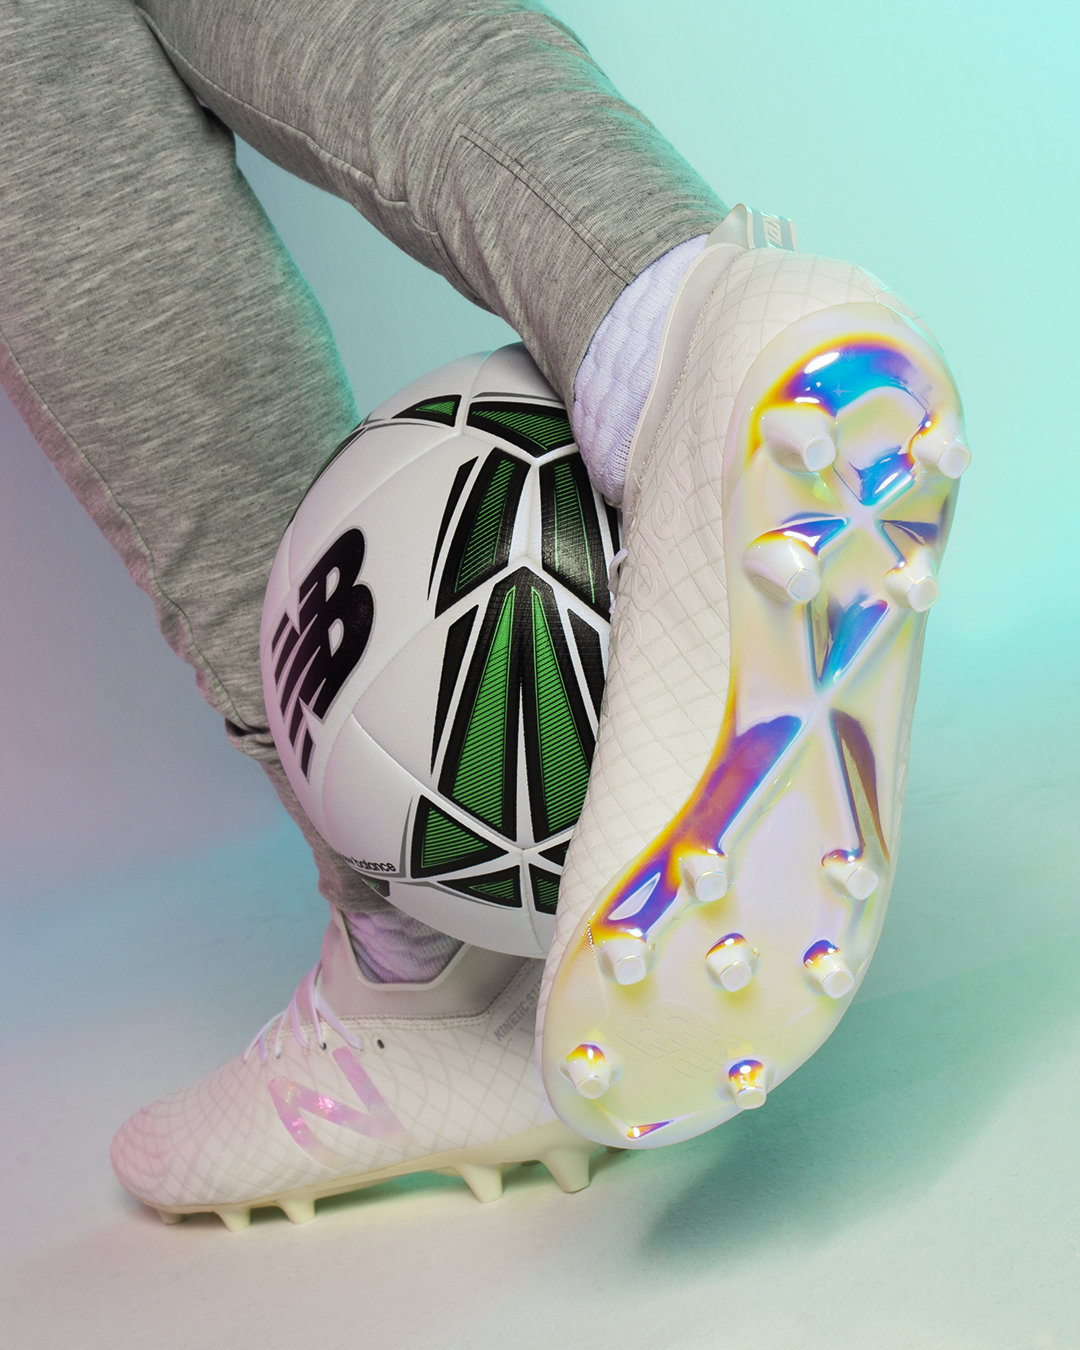 pack-chaussures-new-balance-infinite-lite-tekela-furon-4